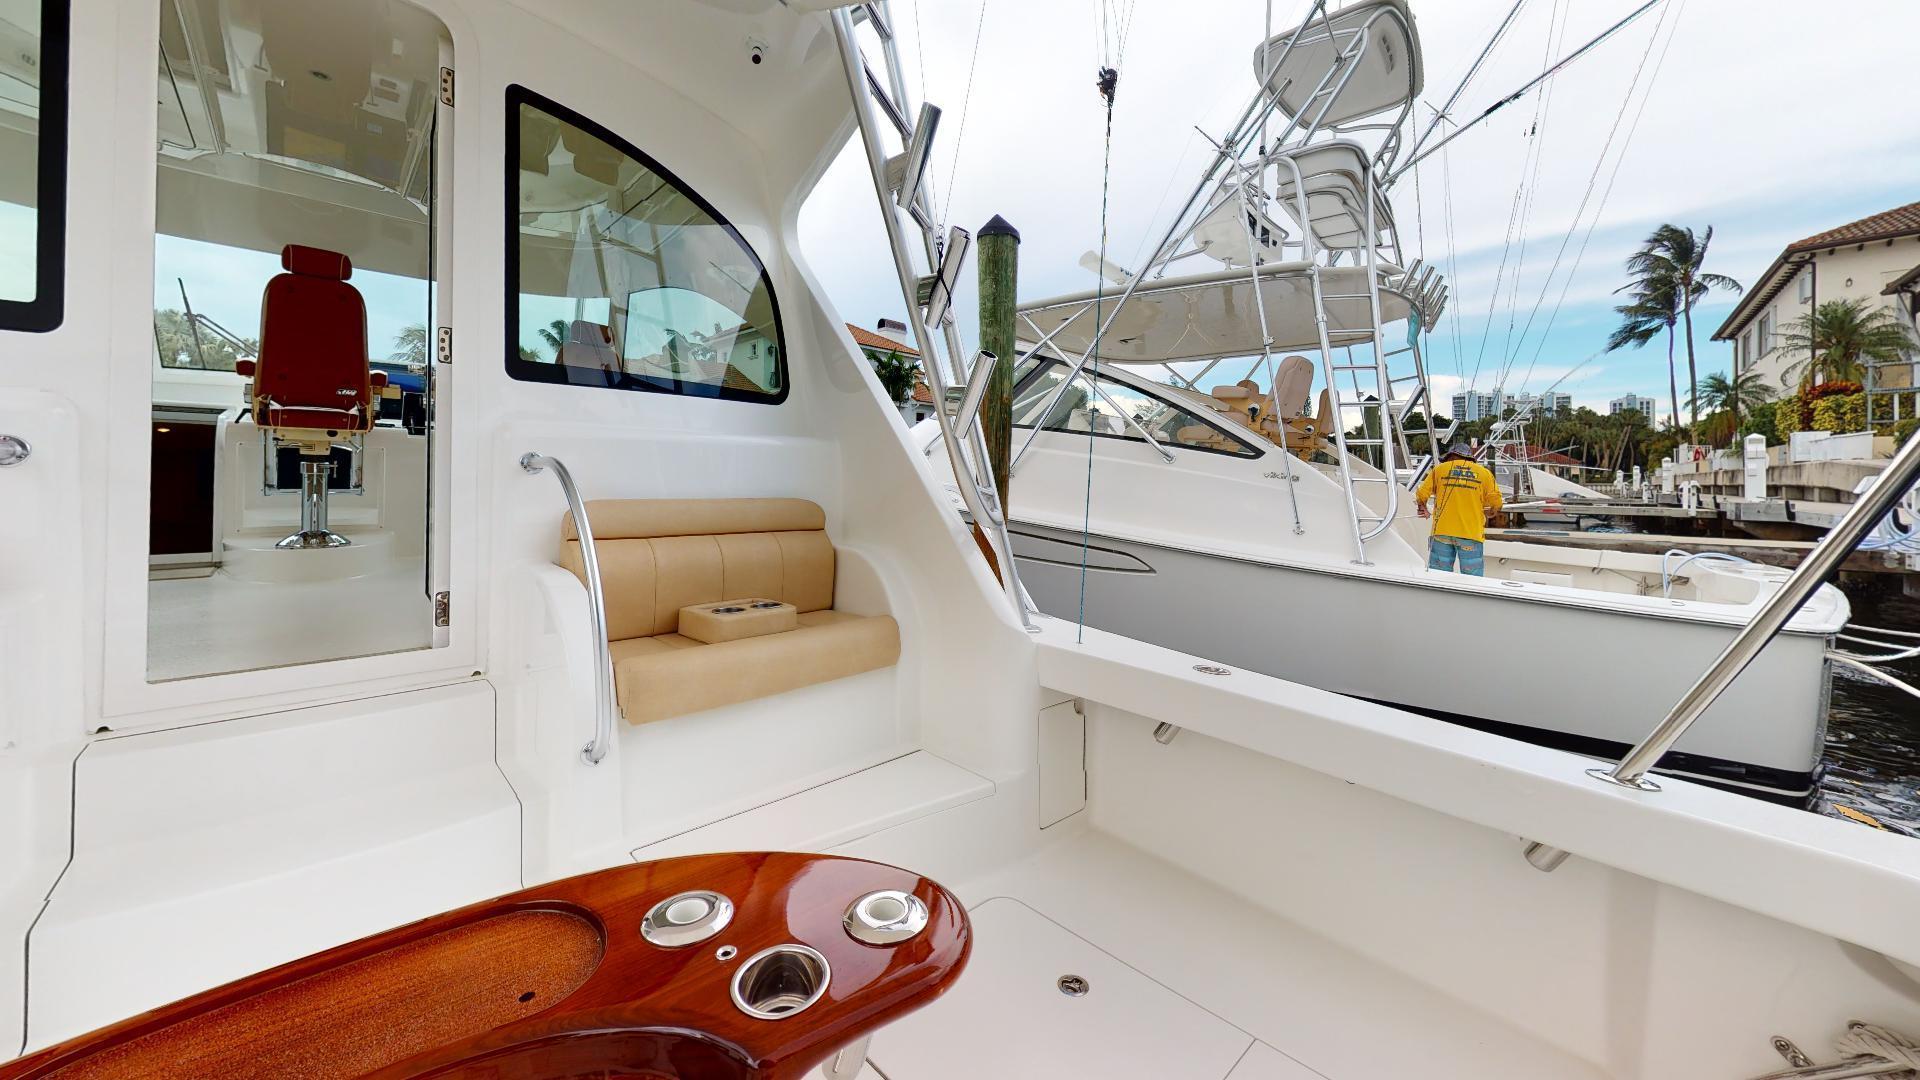 Viking-Sport Tower 2019-Salt Shaker II North Palm Beach-Florida-United States-Cockpit-1498717 | Thumbnail